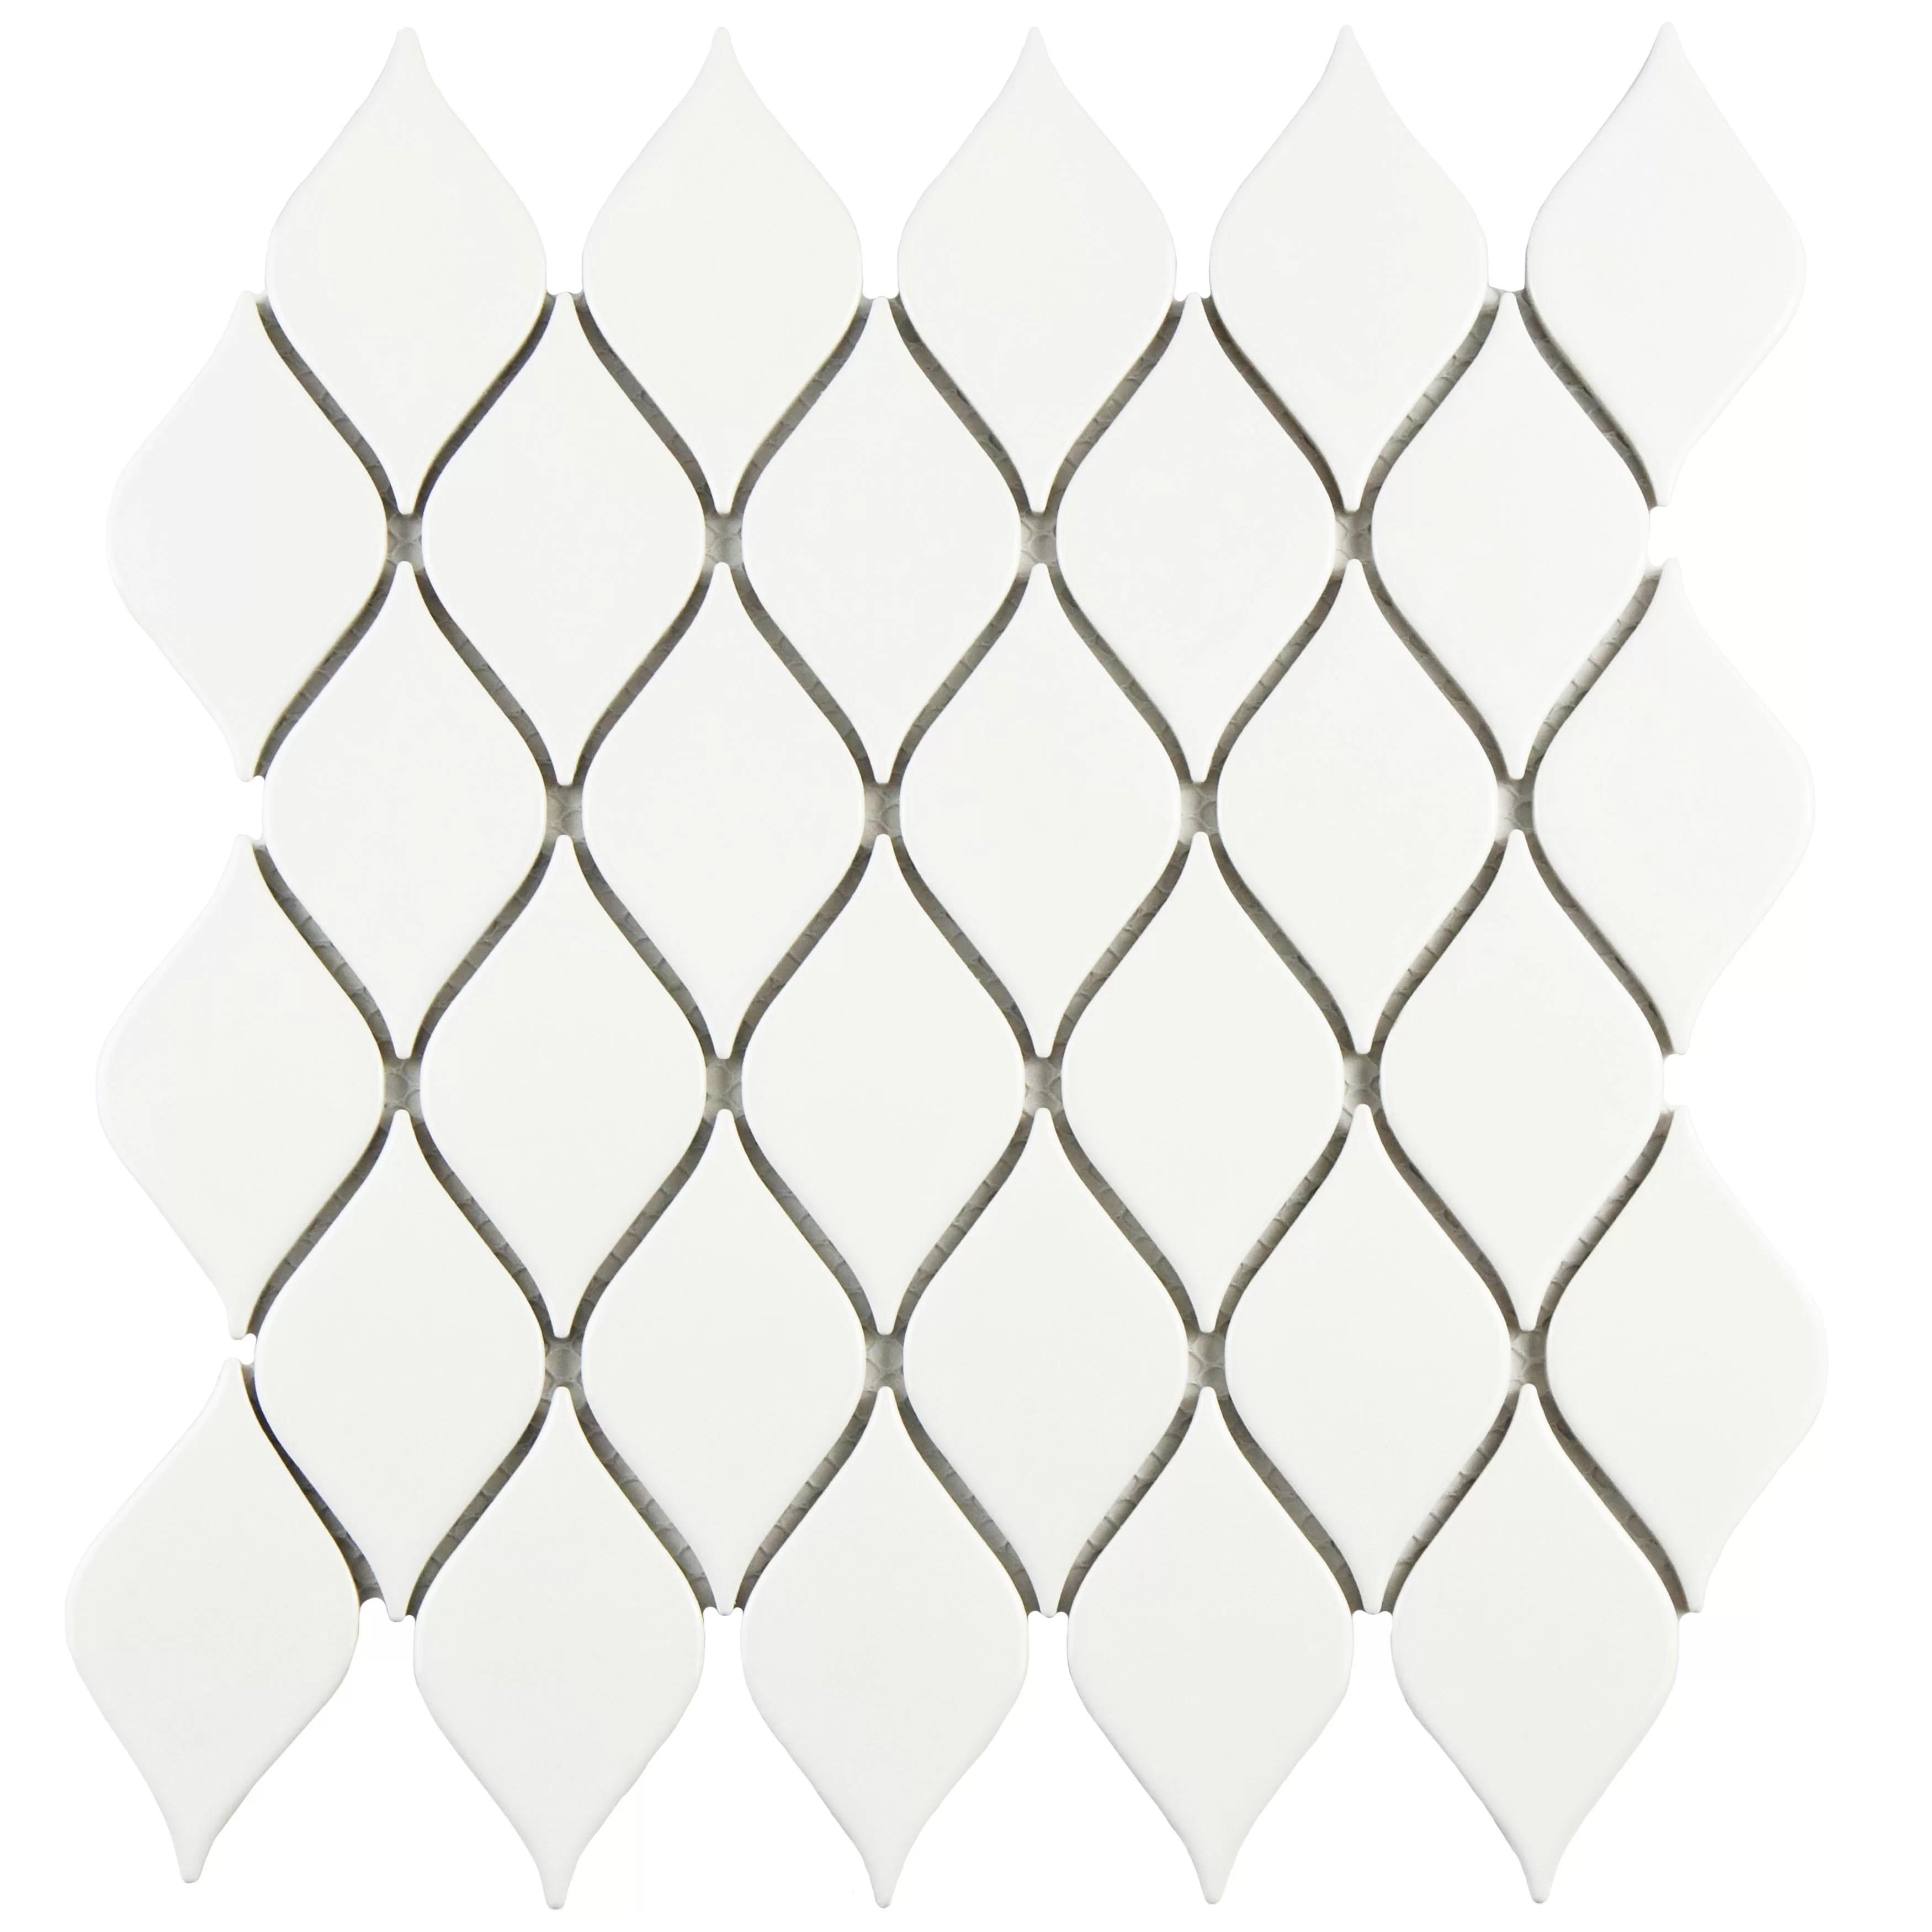 Elitetile Despacio 1 9 X 3 3 Porcelain Mosaic Tile In